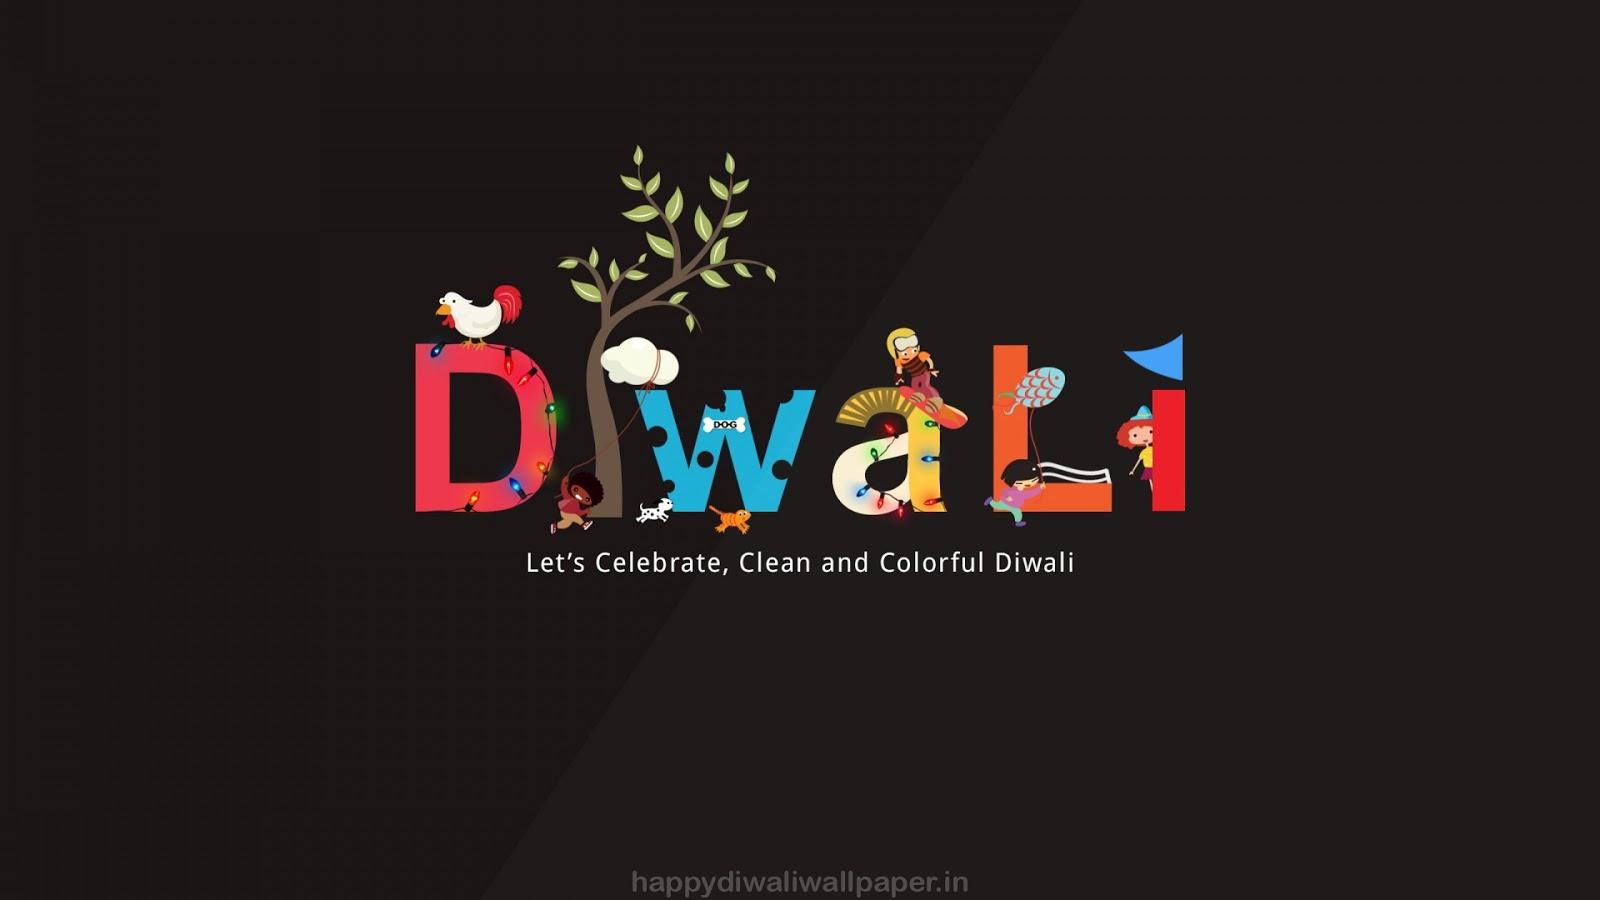 happy diwali wallpaper 2017 - diwalli whatsapp status, videos